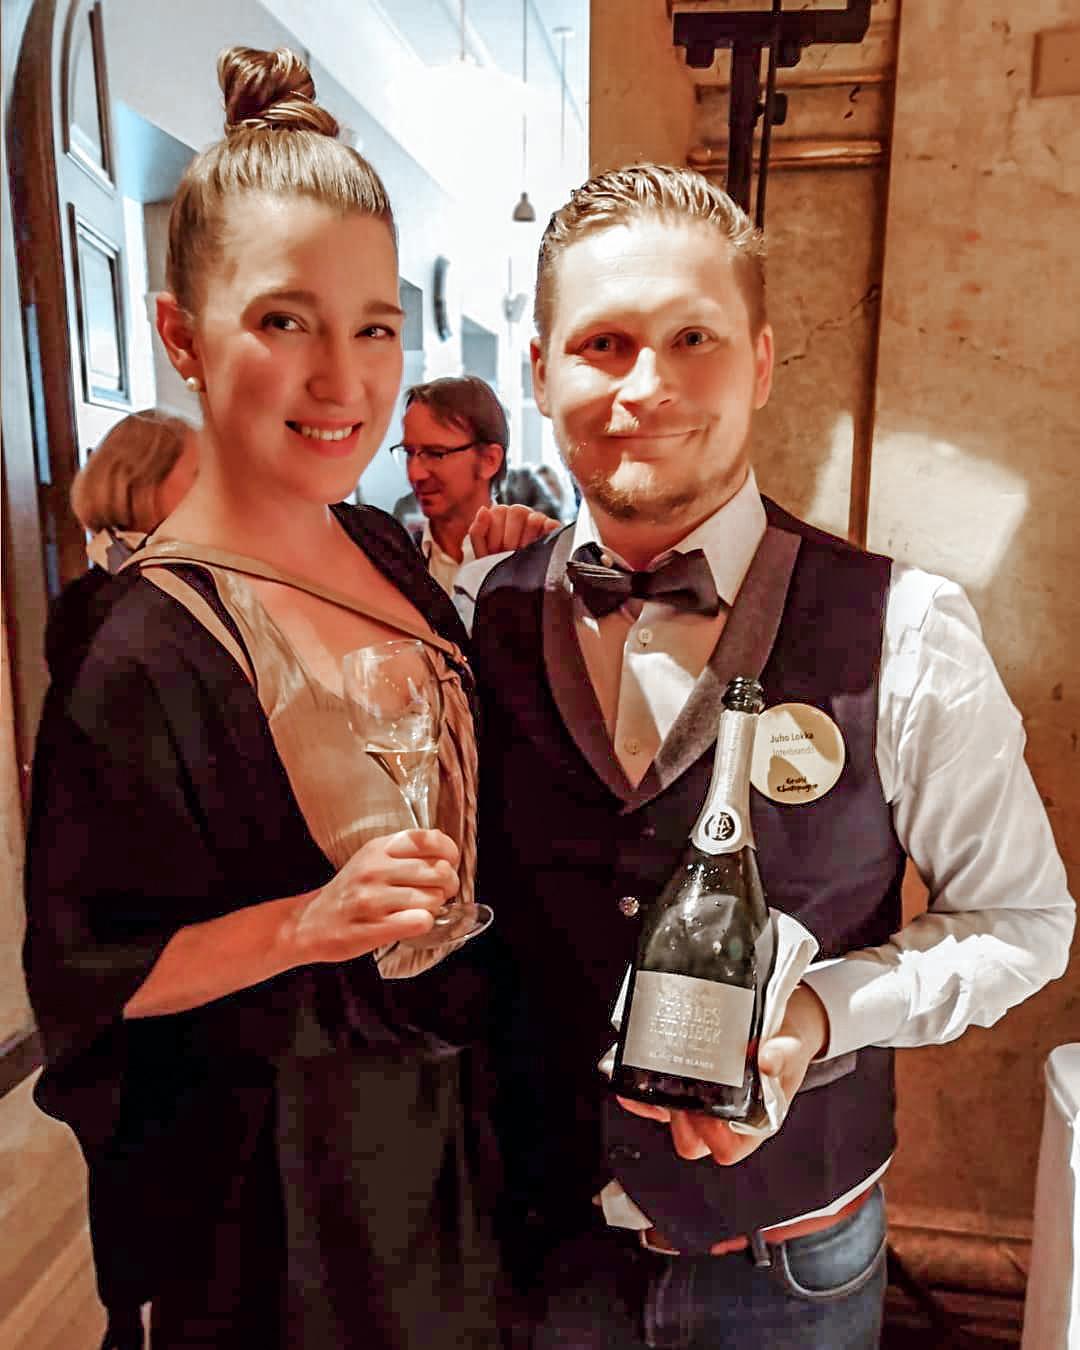 Helsingin parhaat viinitapahtumat Grand Champagne Helsinki Charles Heidsieck